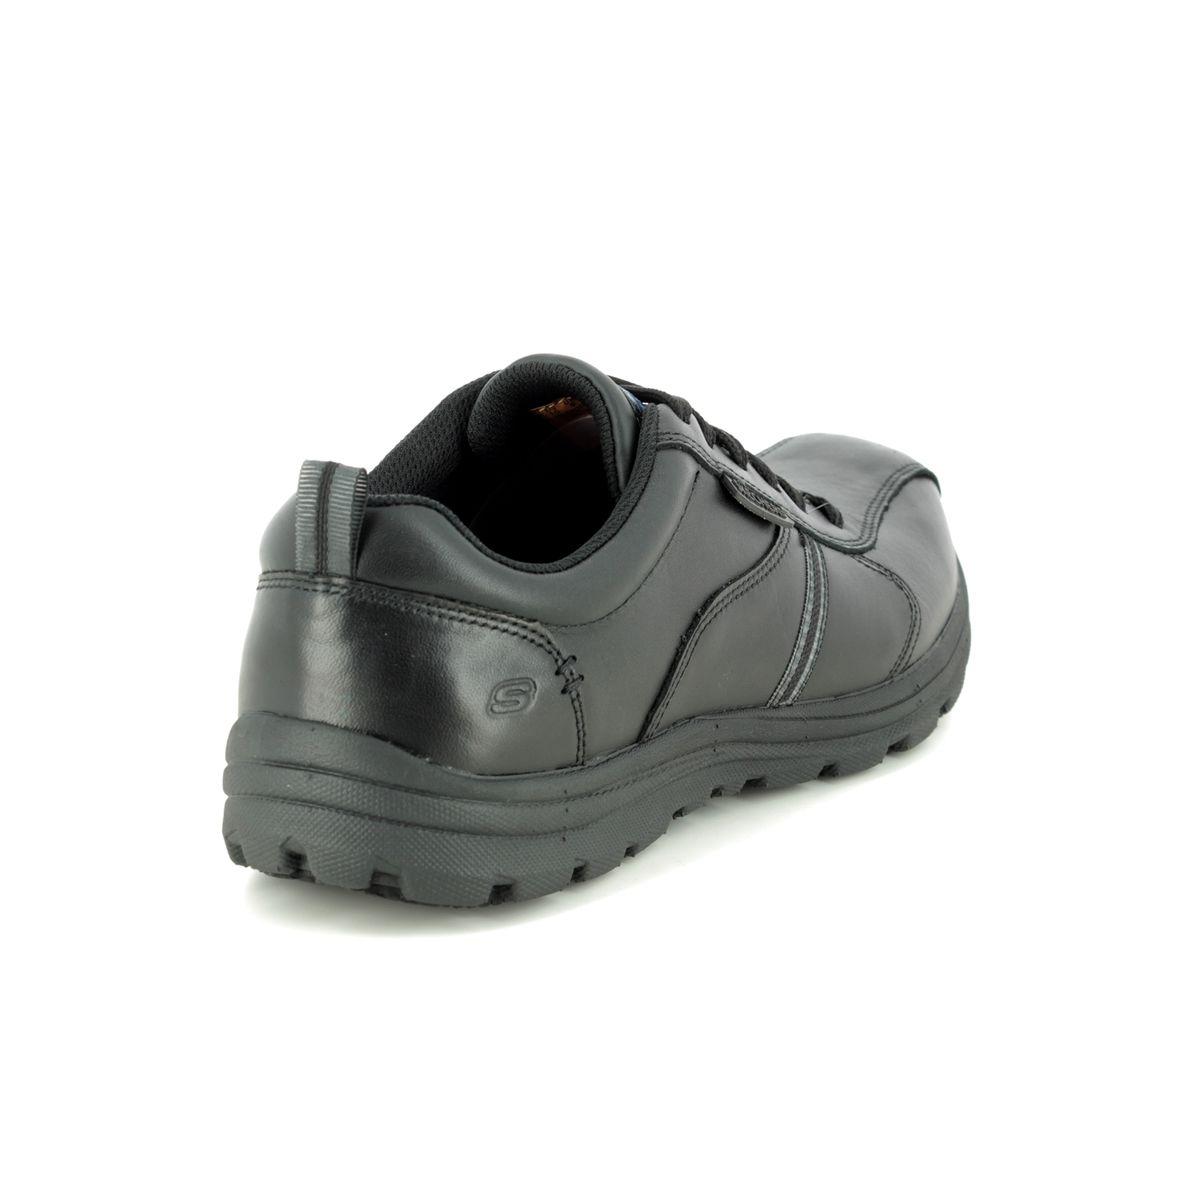 Gracioso Lavar ventanas Contiene  Skechers Safety Work Lacing Slip Resistant 77036EC BLK Black casual shoes